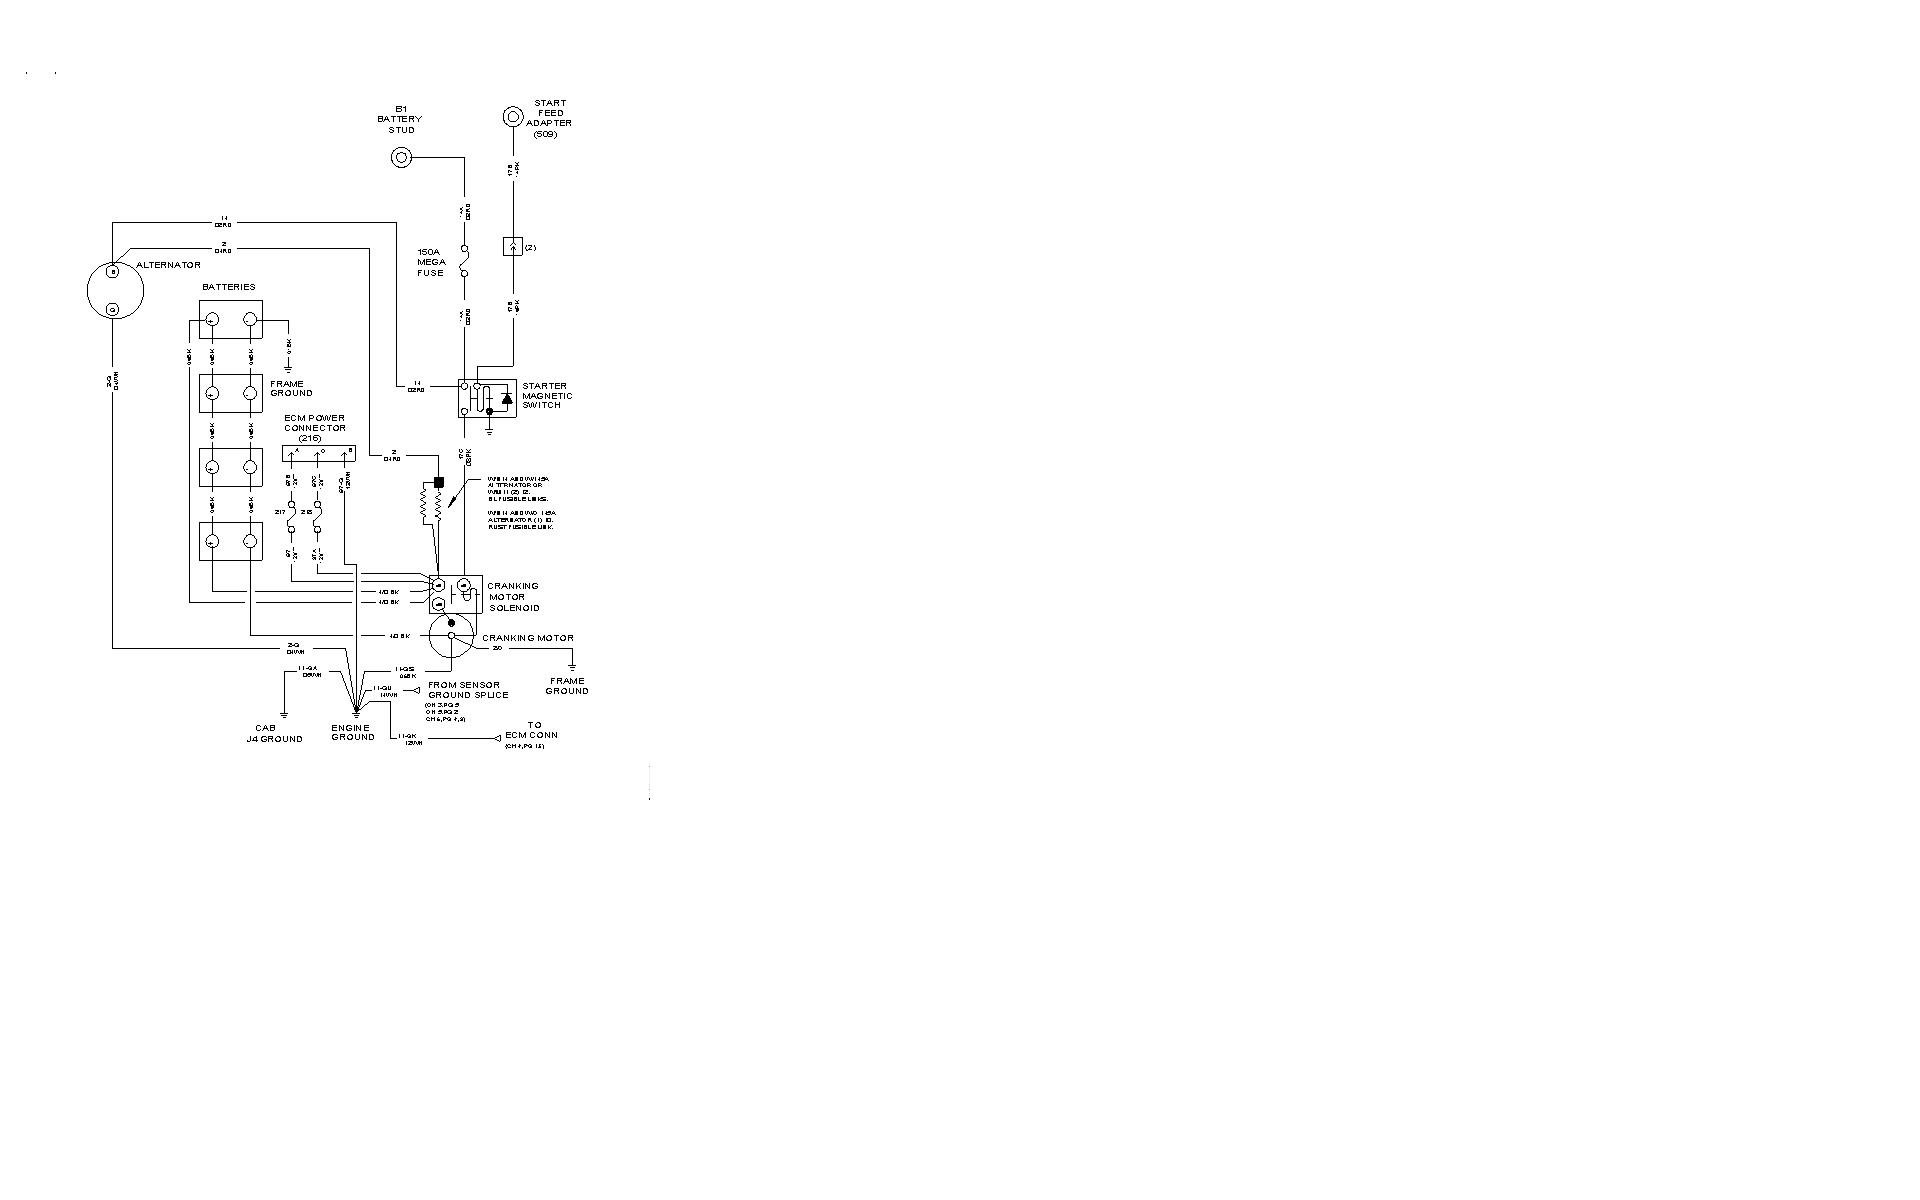 international maxxforce engine diagram in truck get free image about wiring diagram